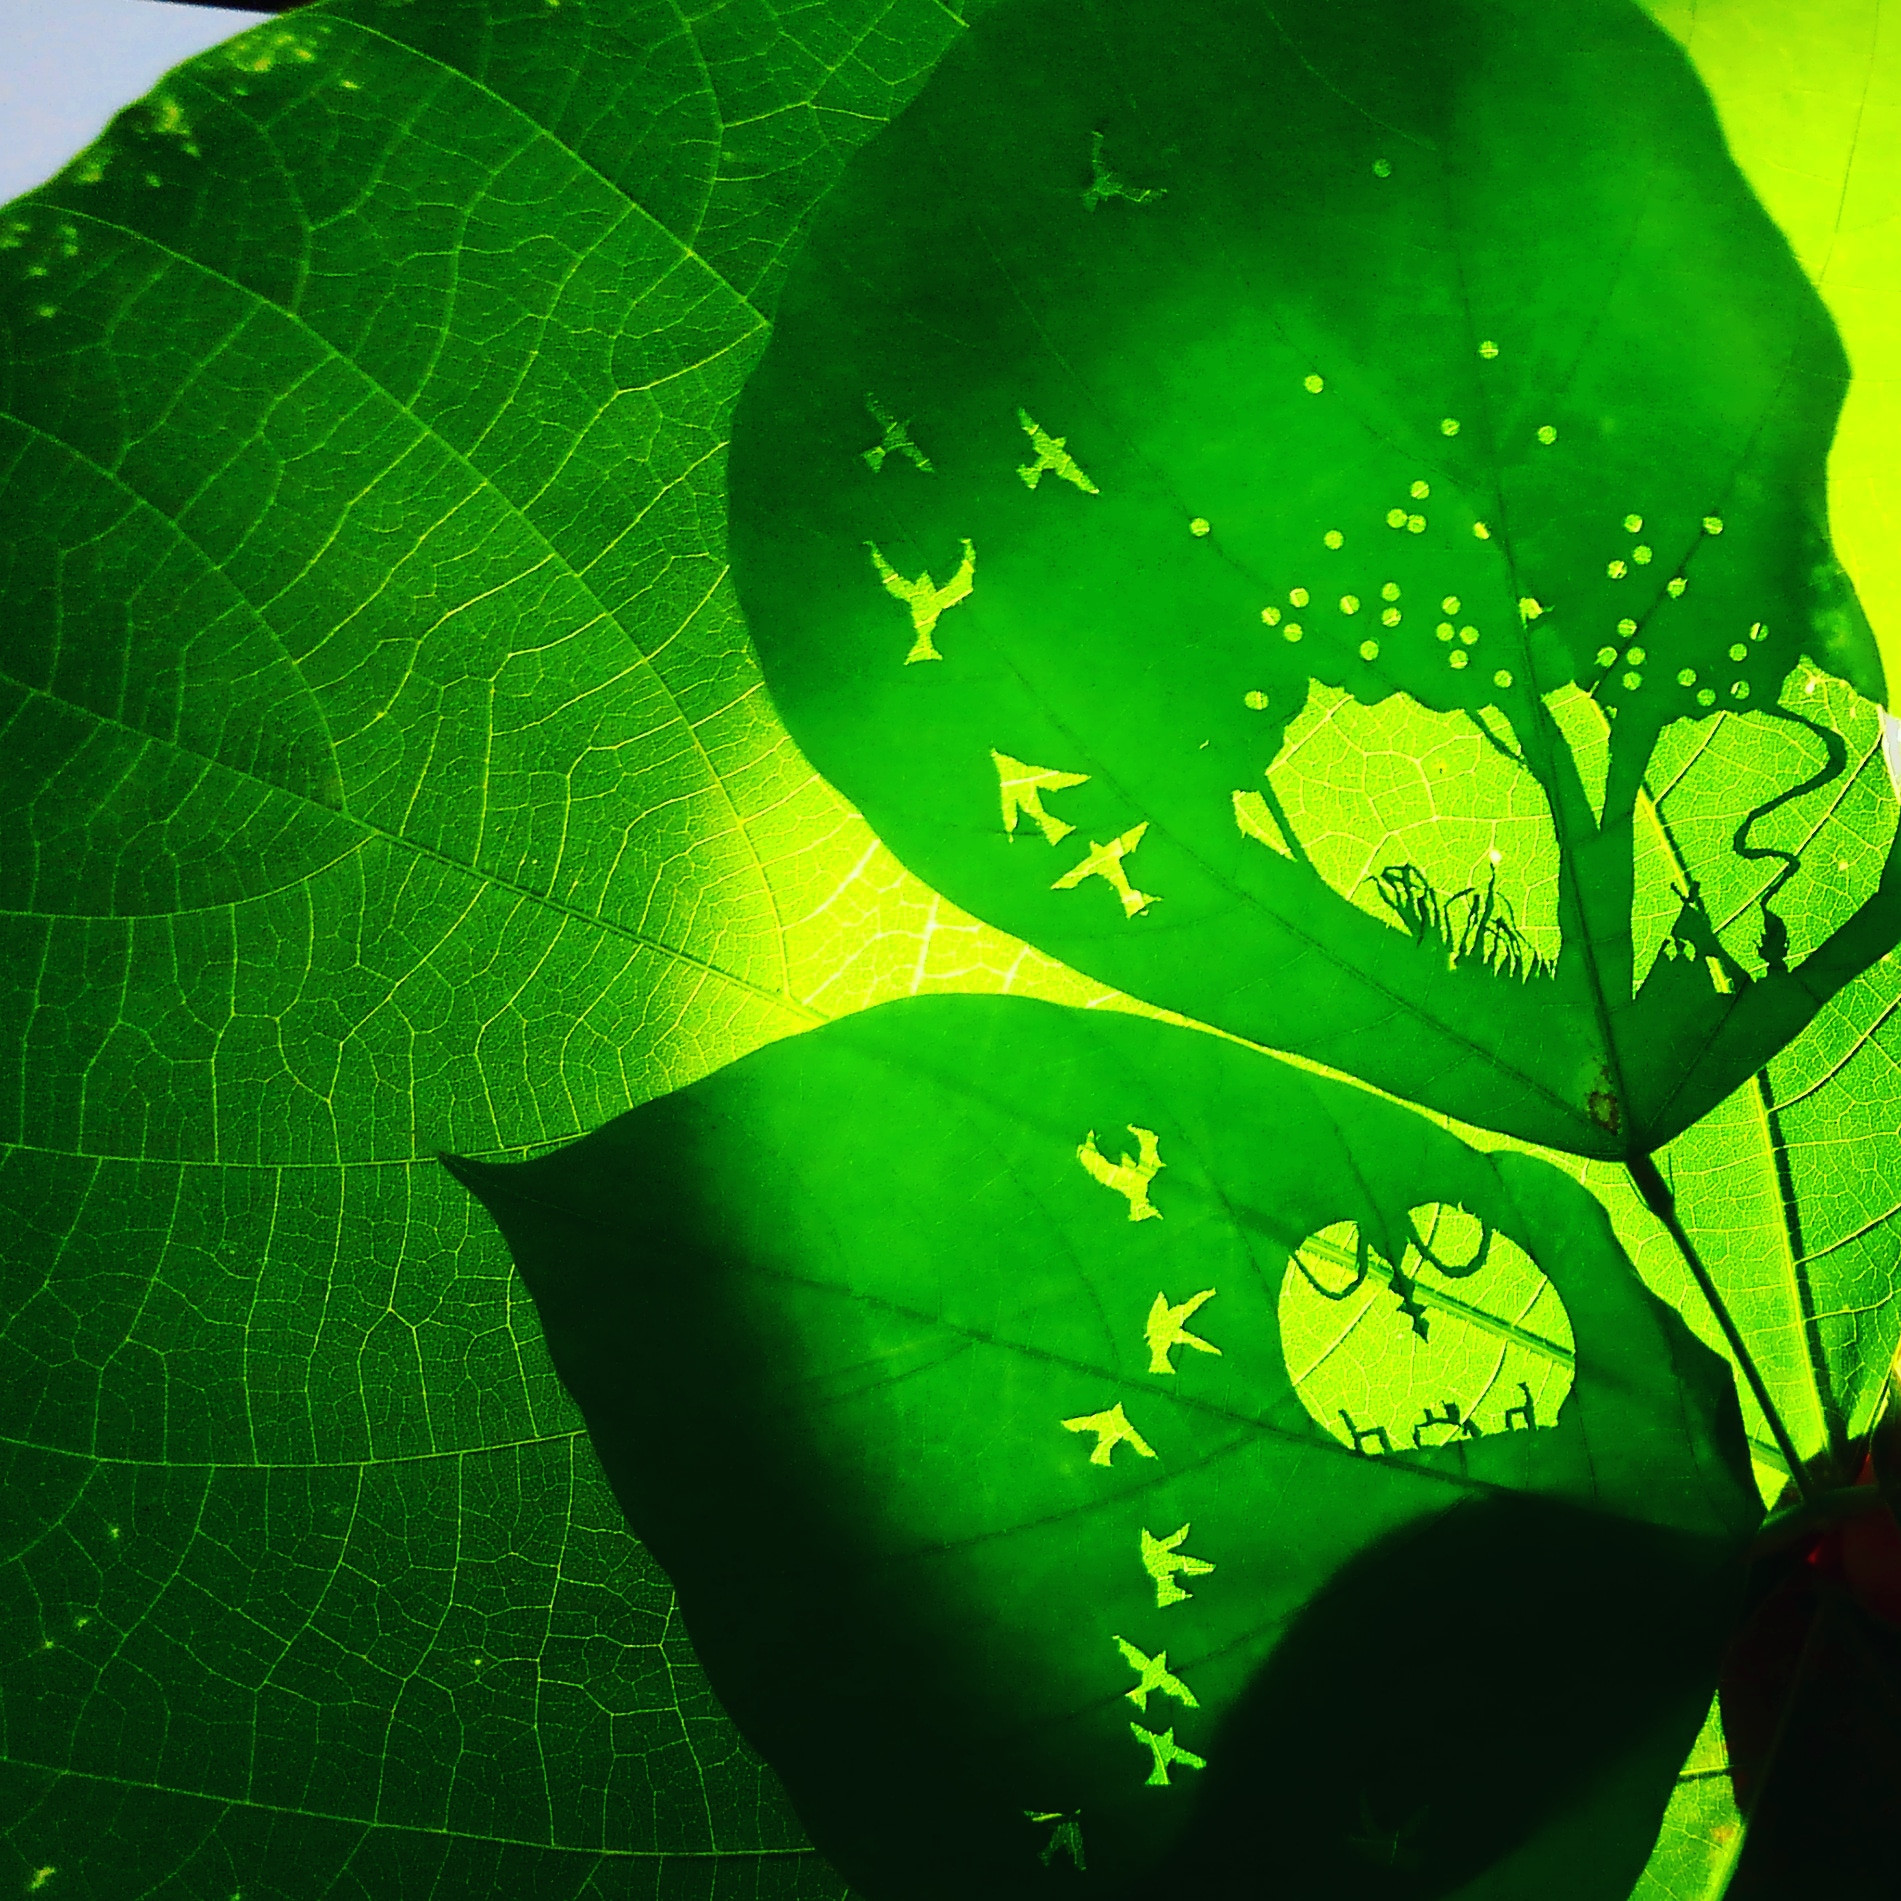 Leaves cutout 2